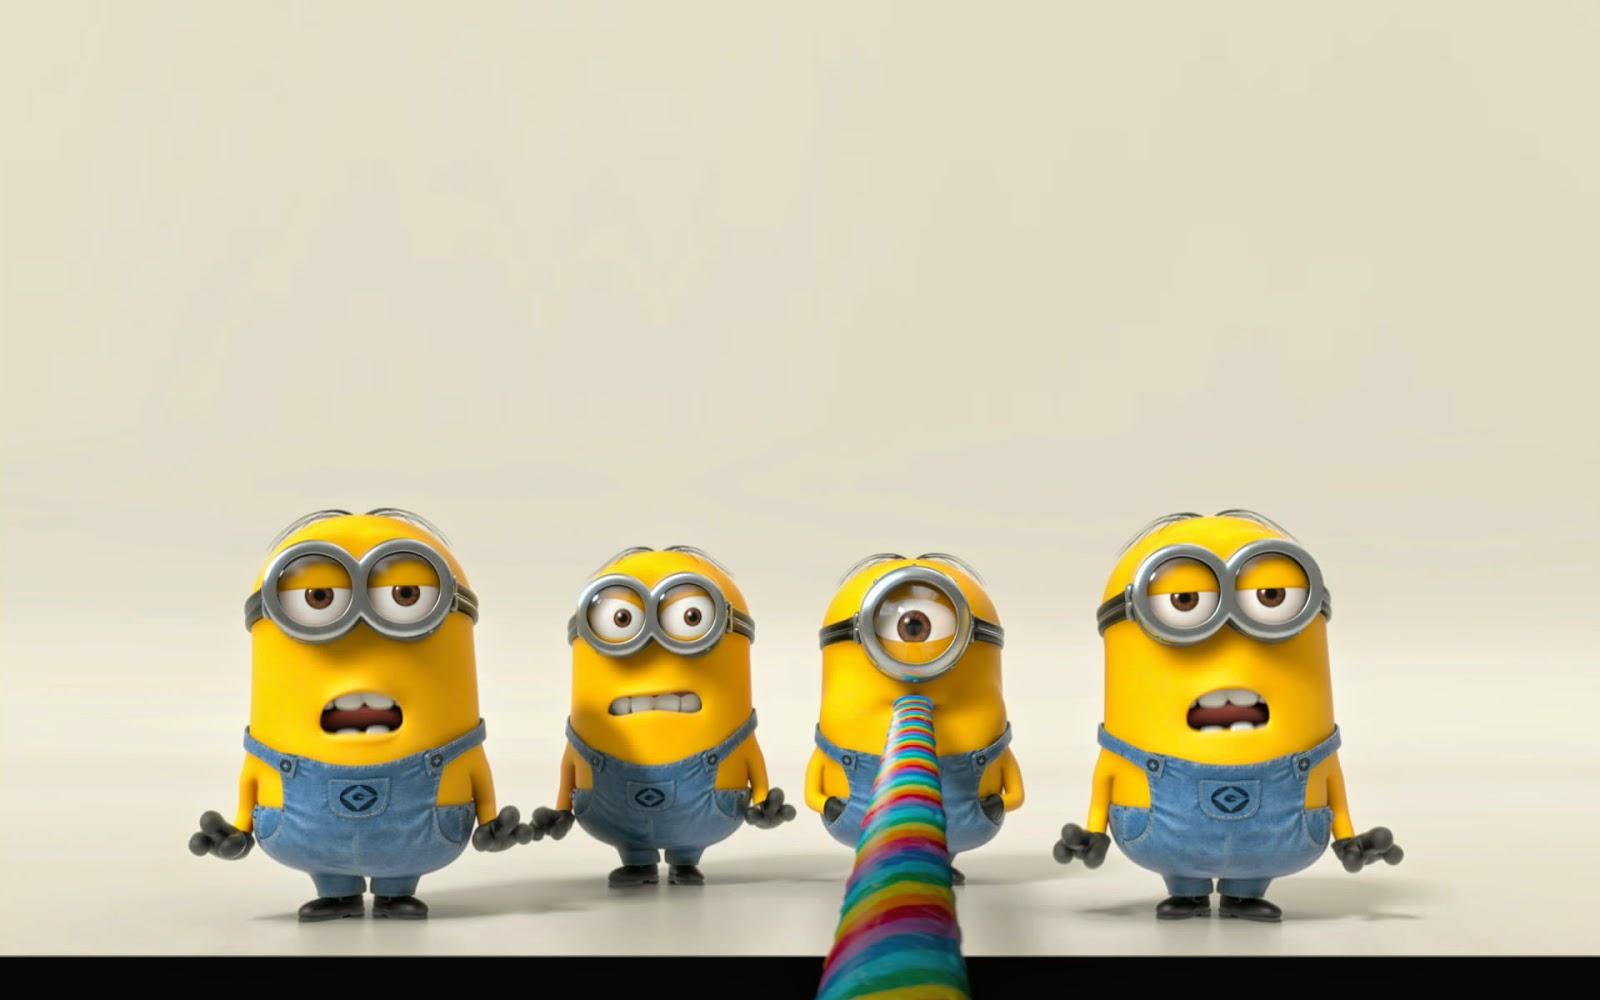 http://gallerycartoon.blogspot.com/2015/03/minions-movie-pictures-10.html